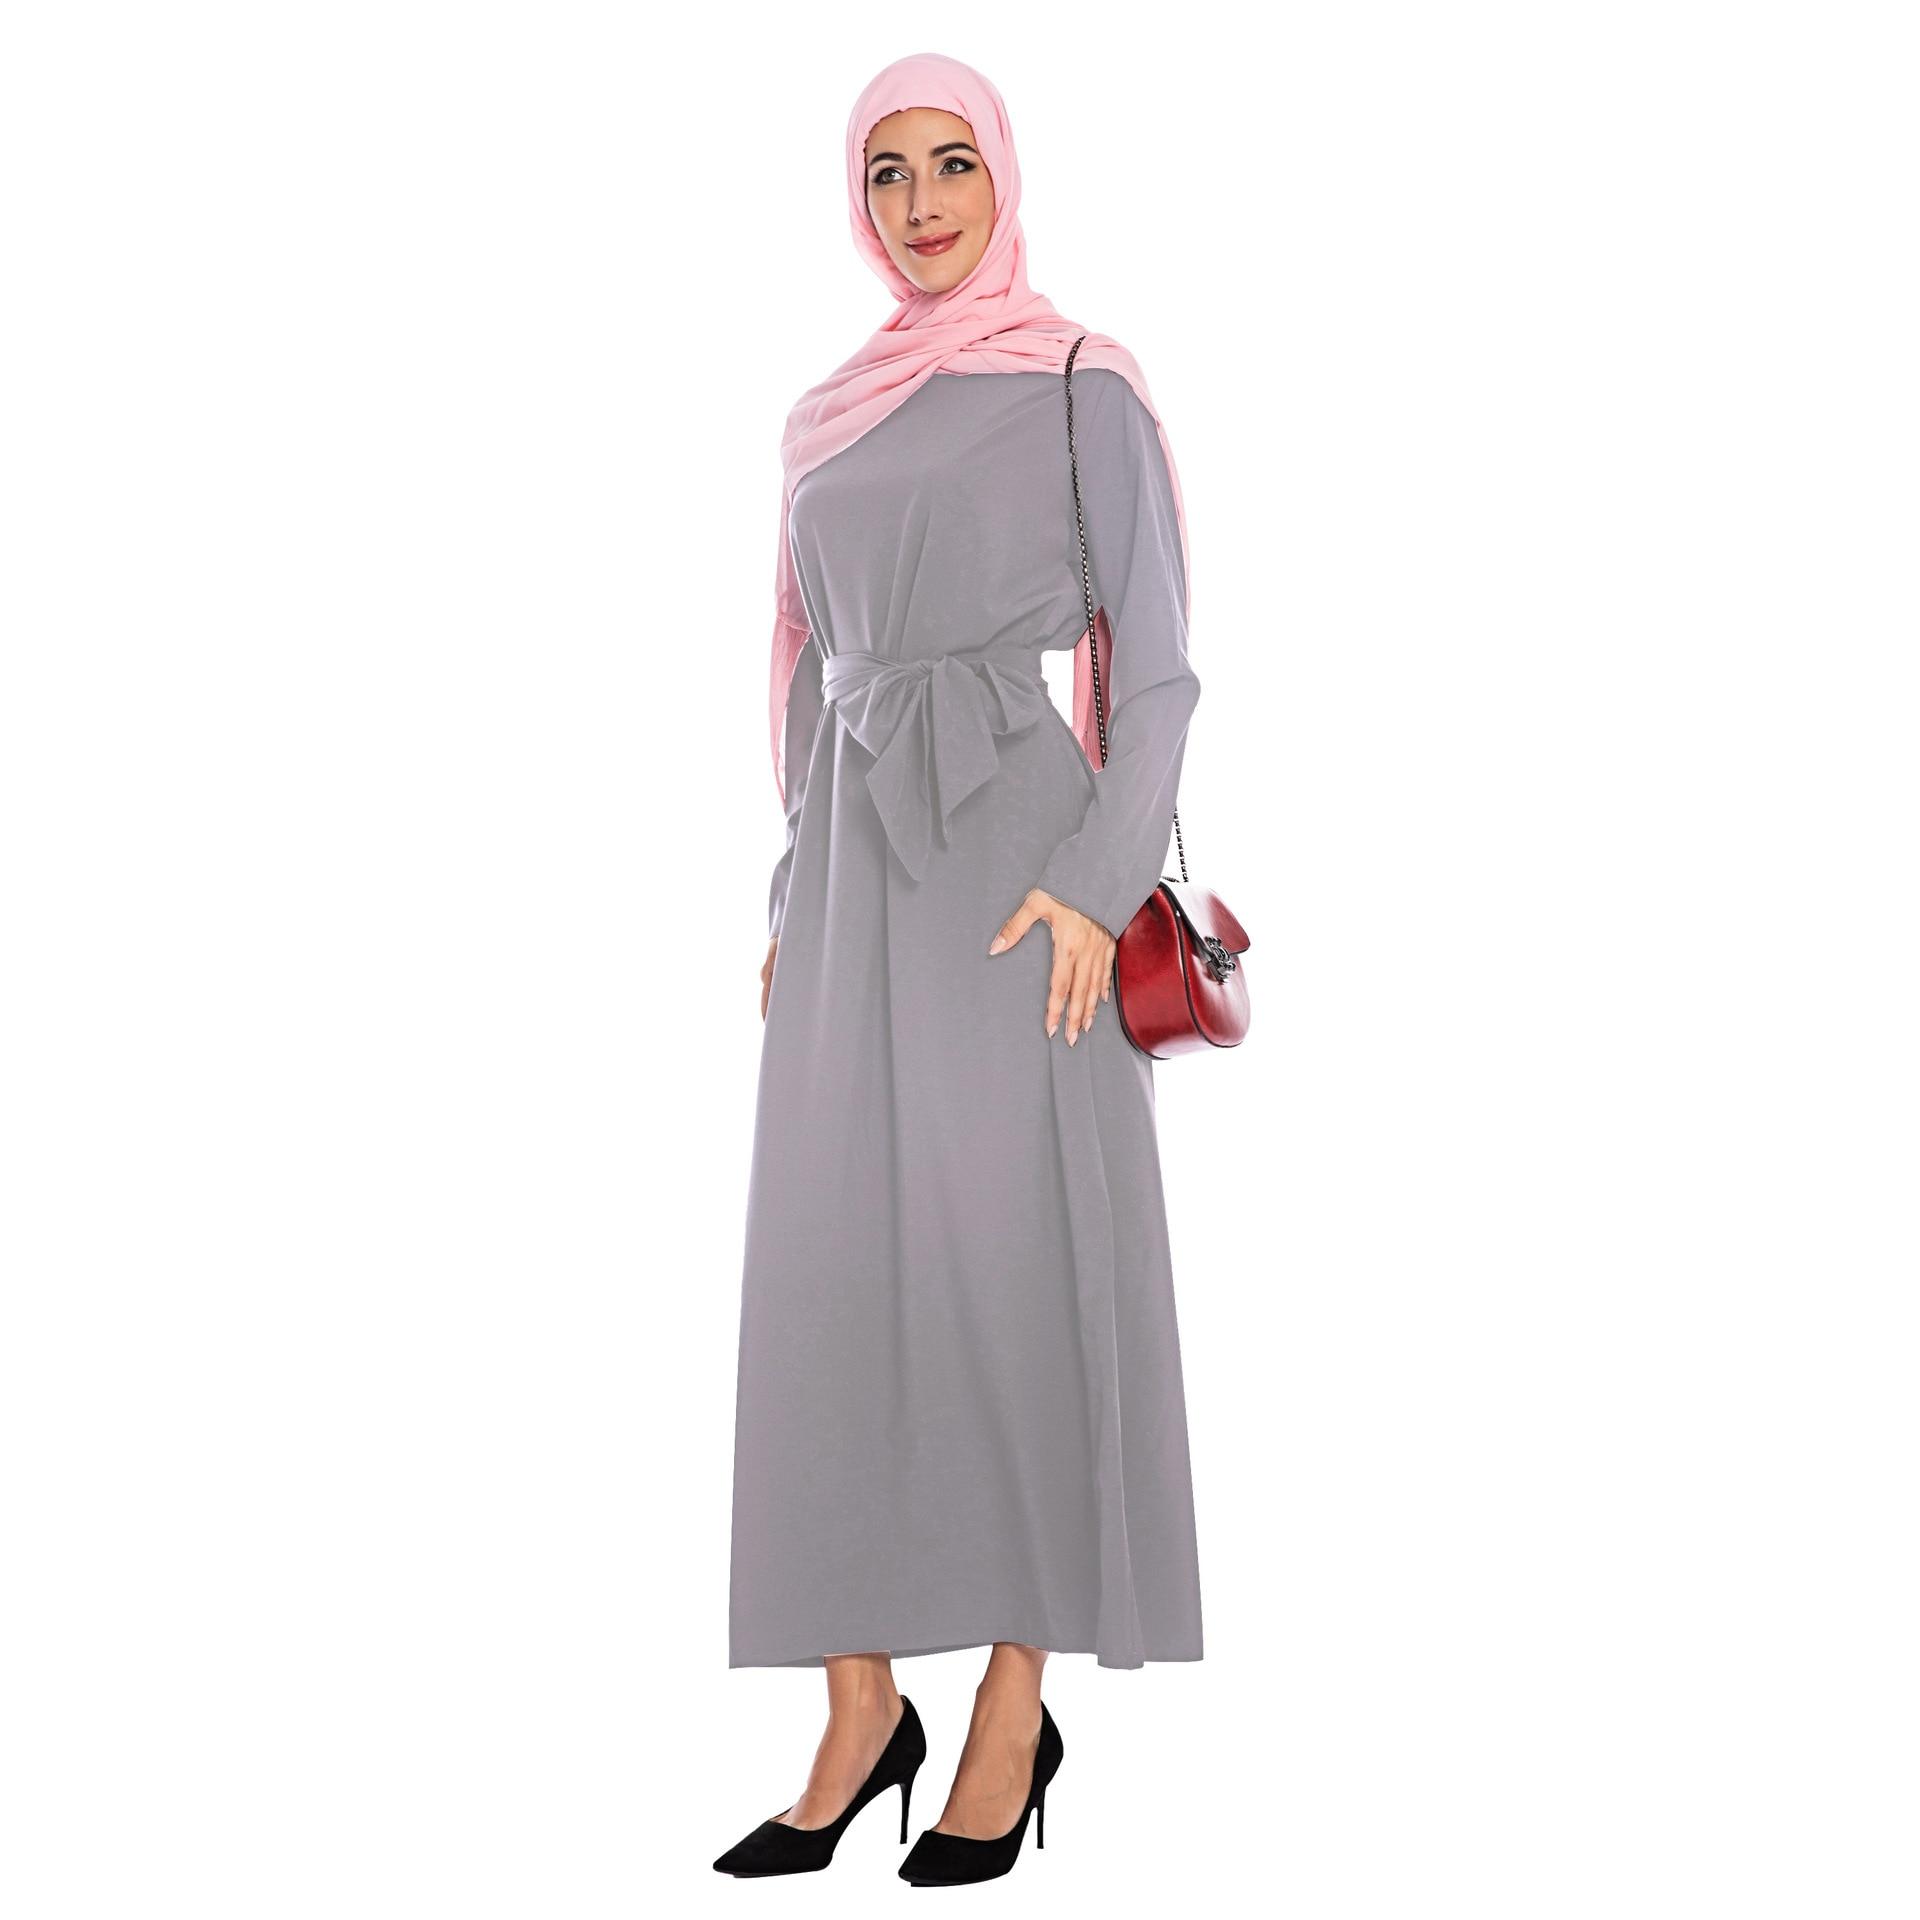 Muslim Abaya Jilbab Saudi Arab Women Long Maxi Dress Islamic Robe Kaftan Gown Arab Casual Hijab Dress Prayer Worship Service